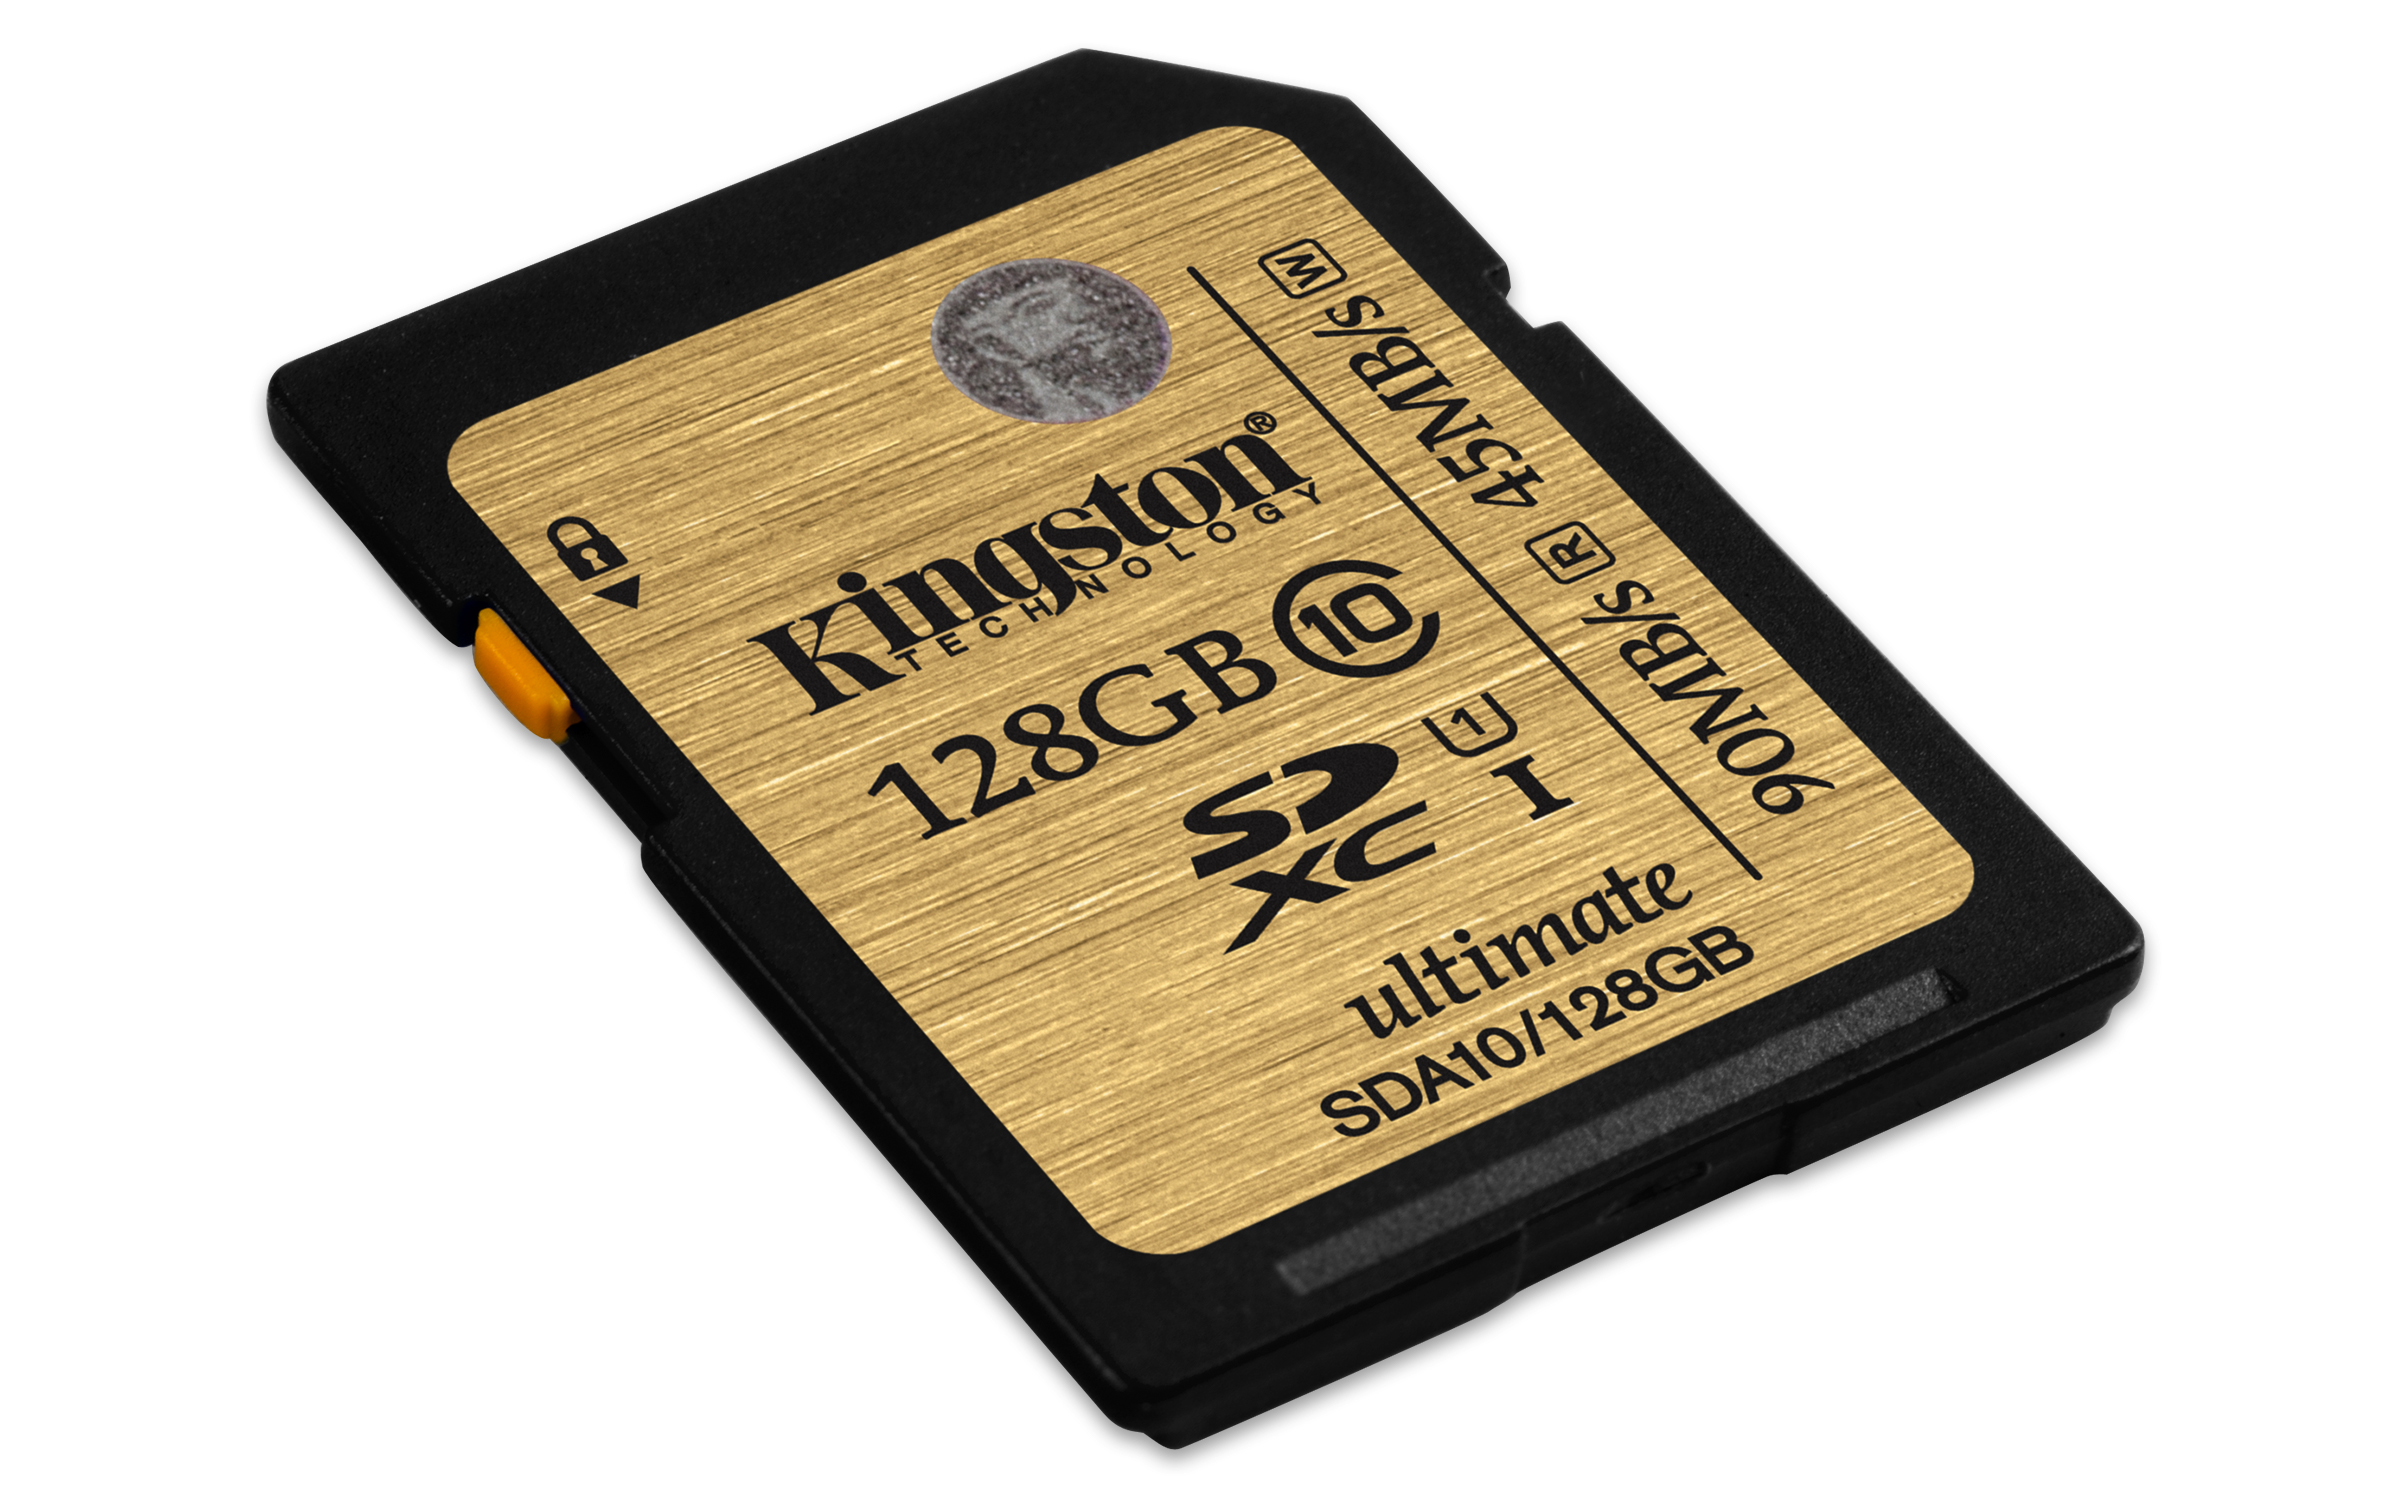 Kingston 128GB SecureDigital (SDXC) UHS-I Ultimate Memory Card (Class 10)